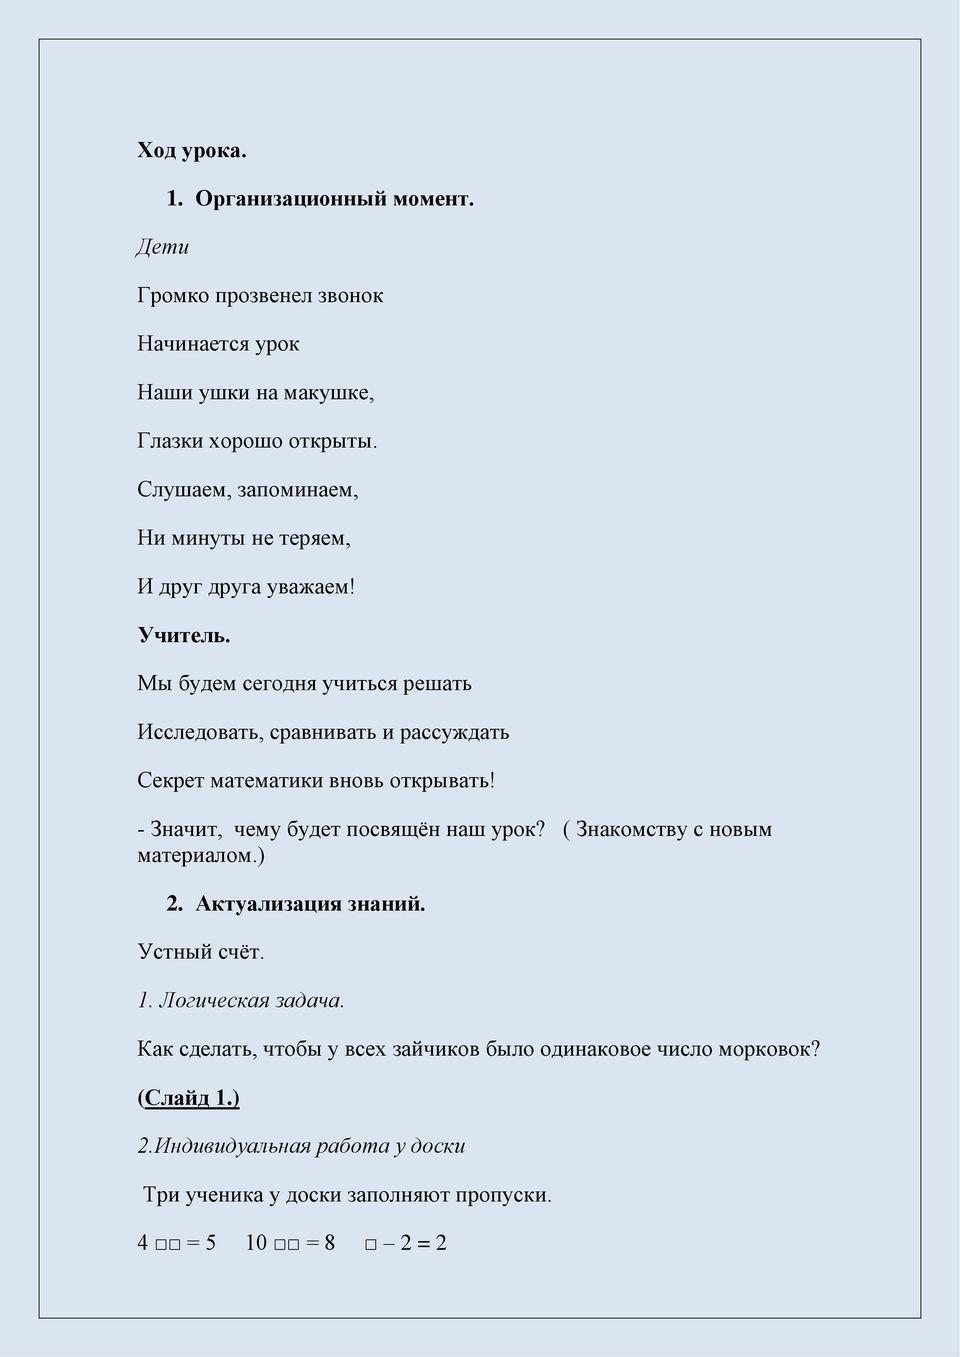 Гдз по русскому языку 8 класса саба